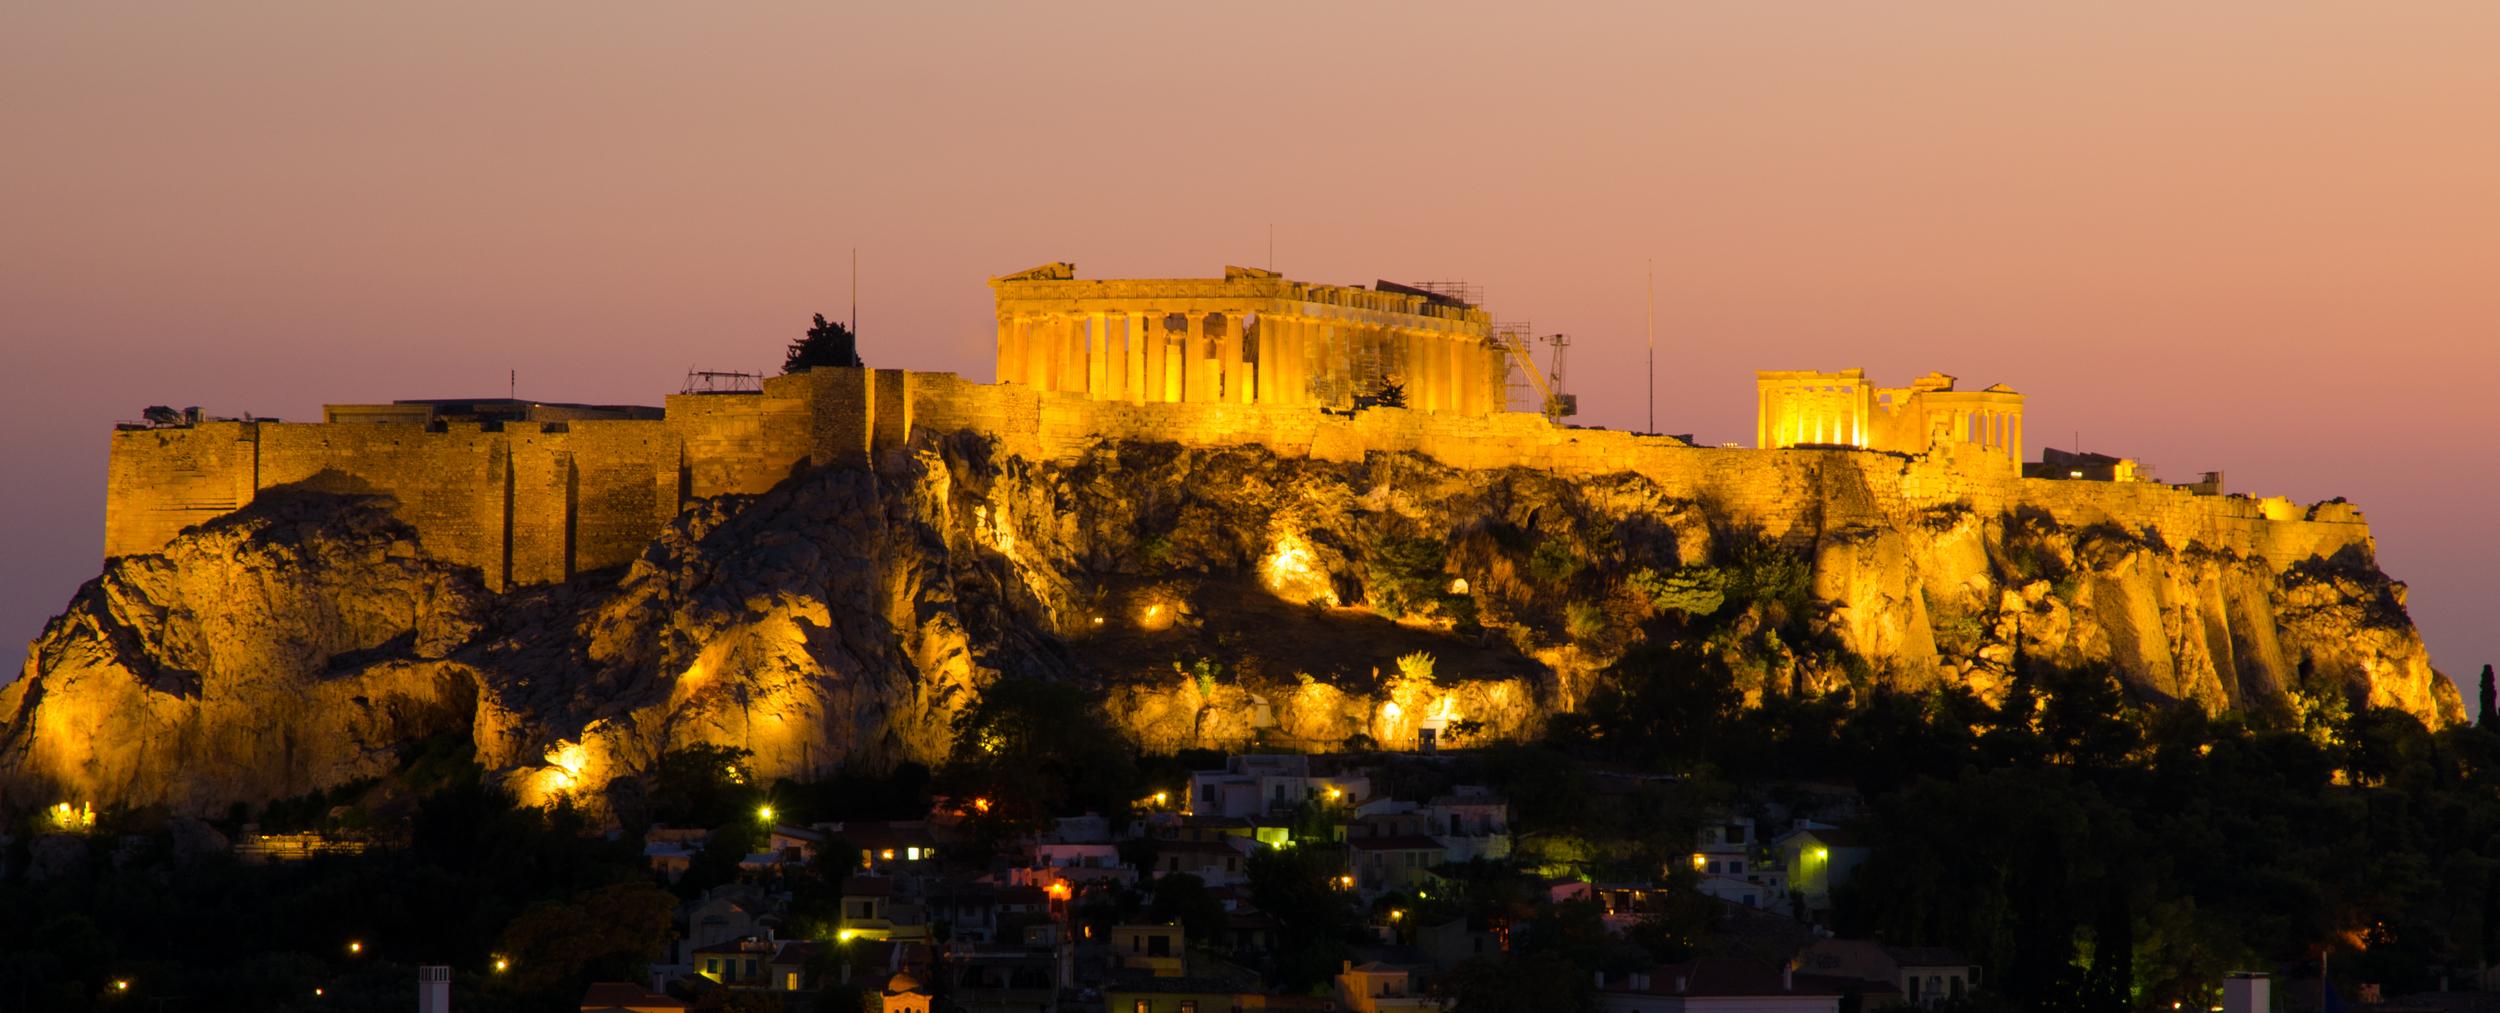 Light of Greece 2012-3031.jpg